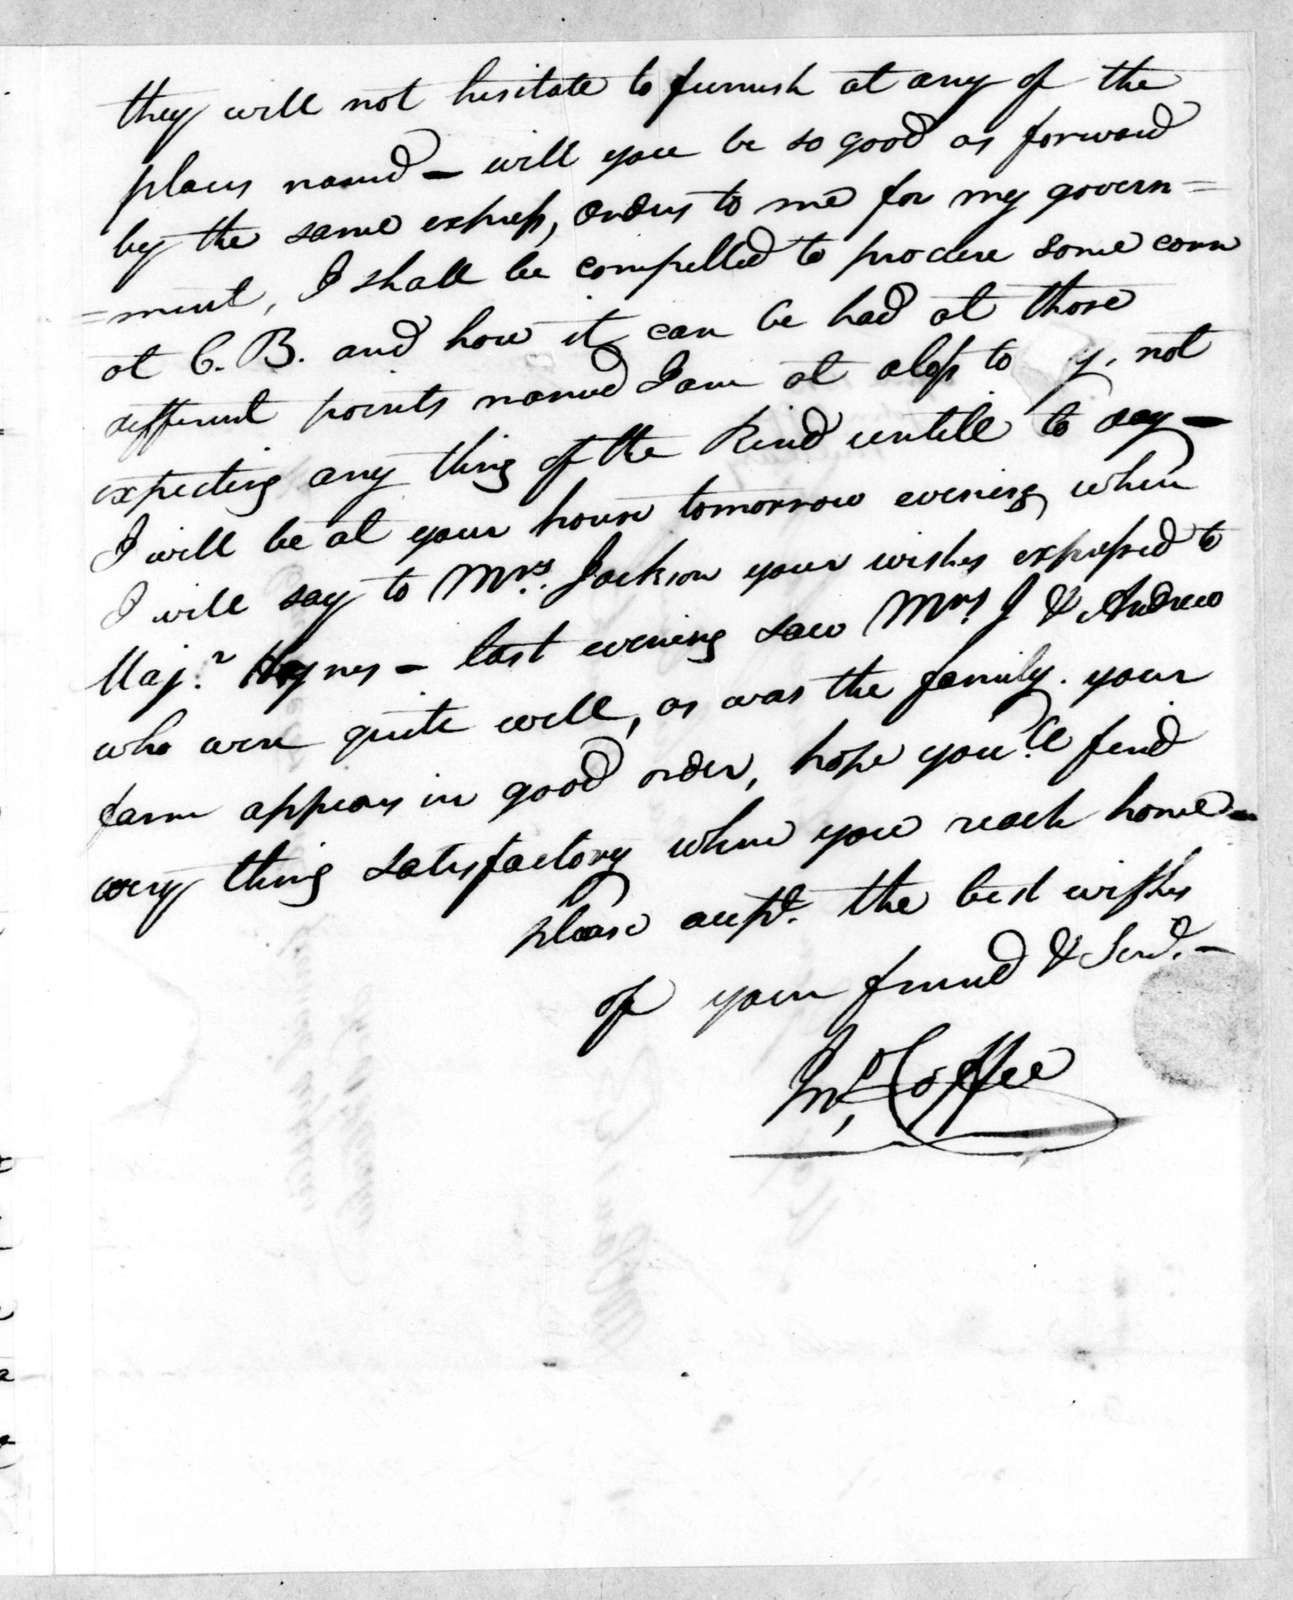 John Coffee to Andrew Jackson, April 19, 1813